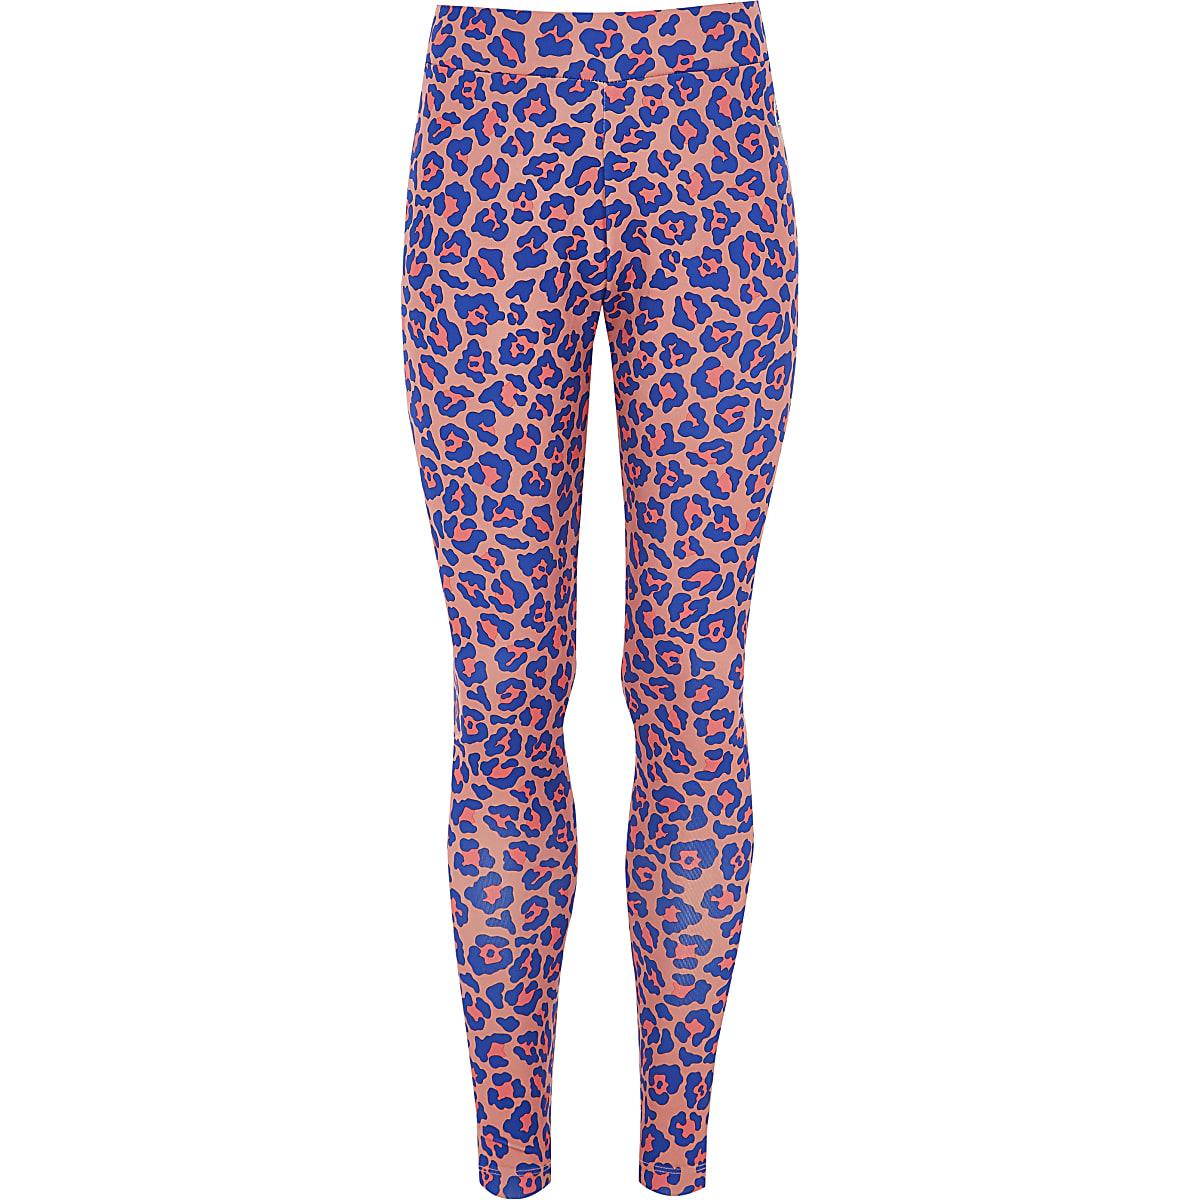 Girls Converse pink leopard print leggings